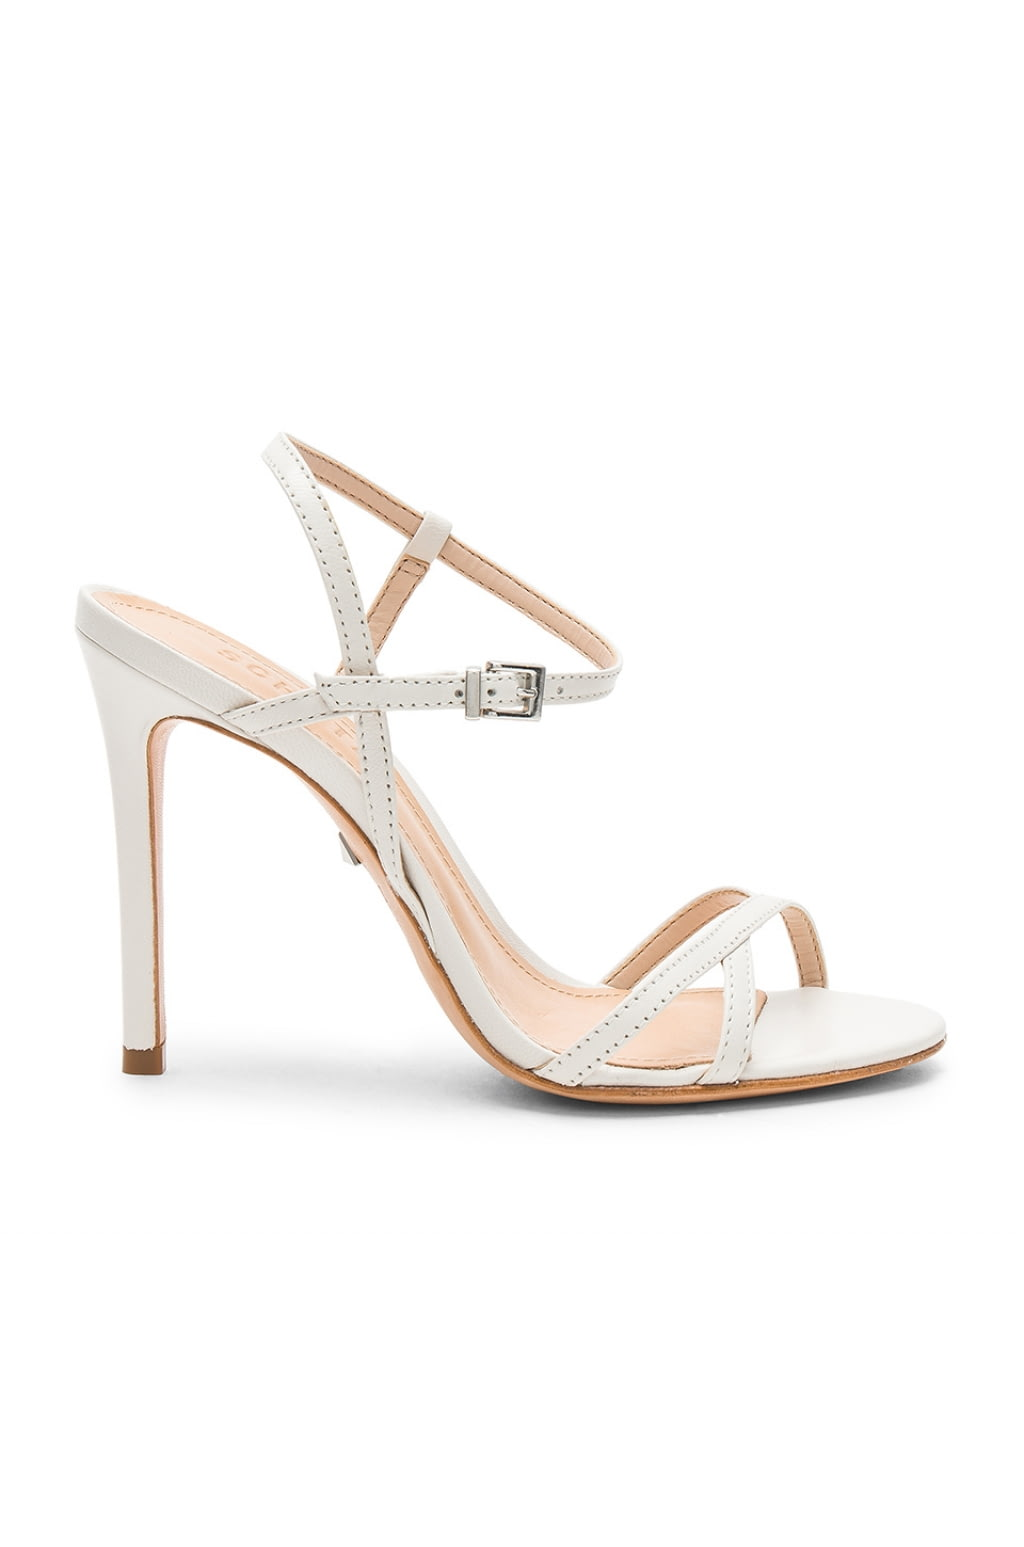 Opal Sandal in White. - size 8 (also in 10,6,6.5,7,7.5,8.5,9,9.5) Schutz